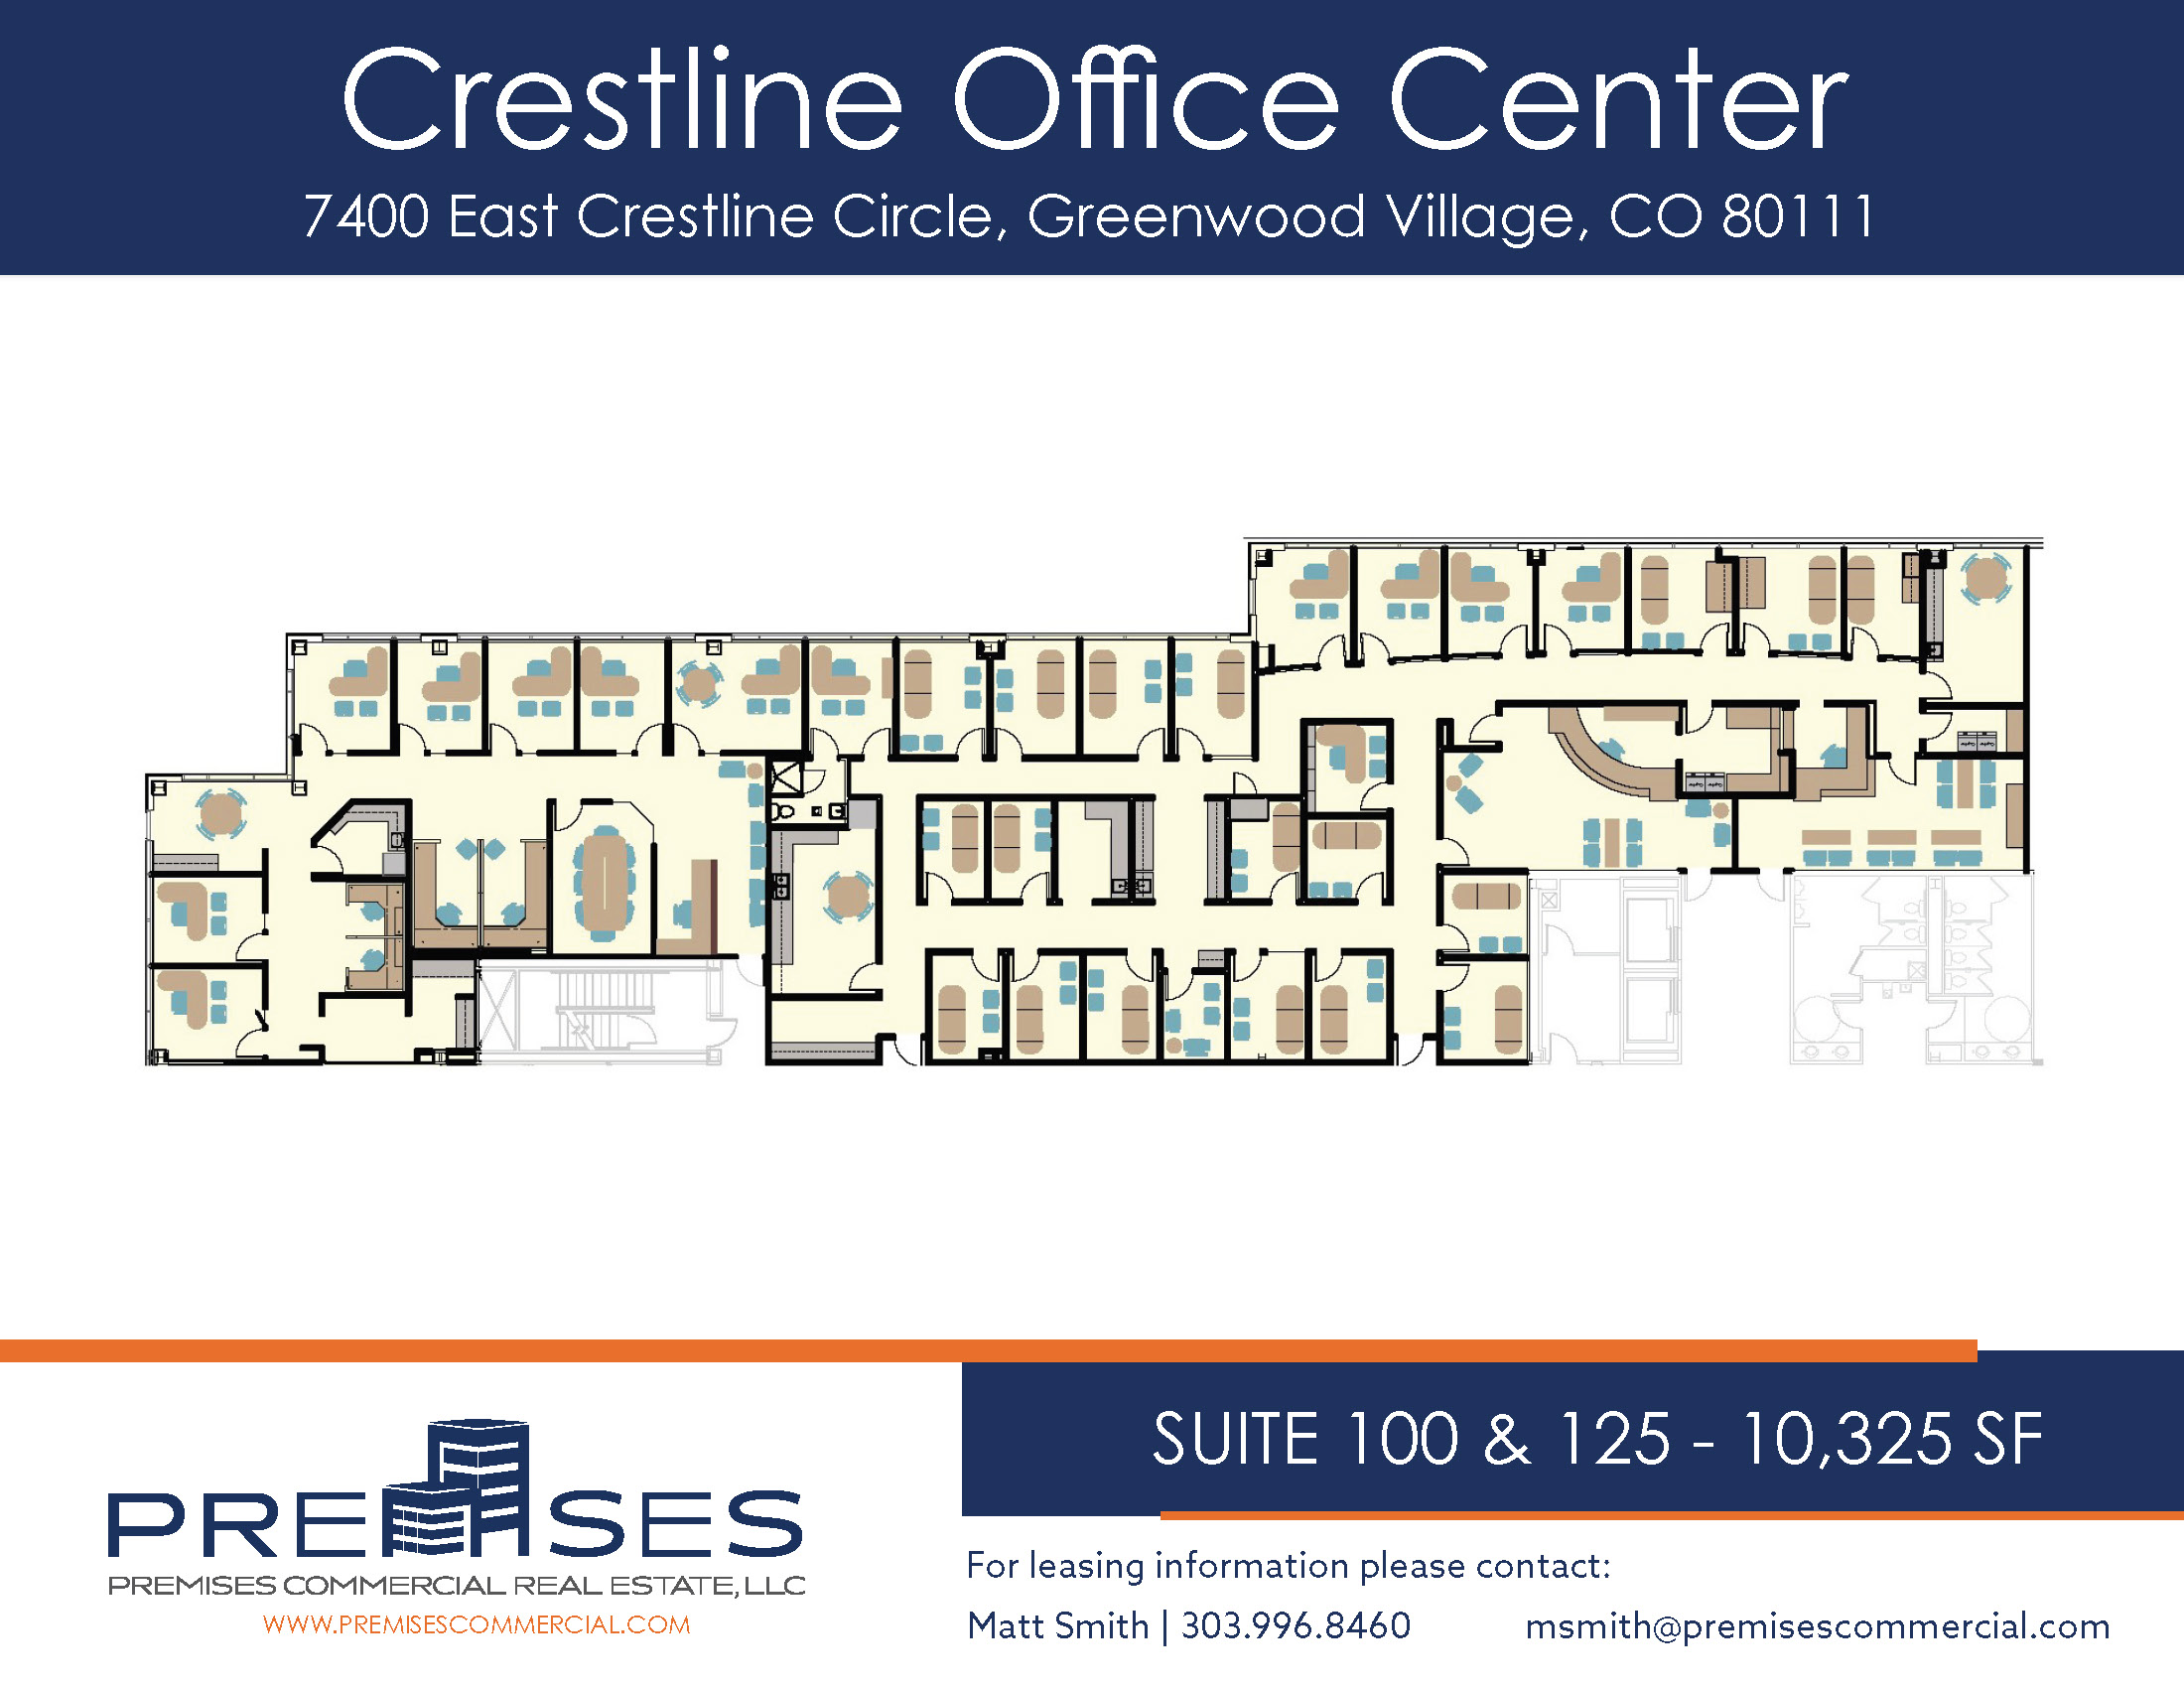 Suites 100 & 125 - 10,325 sf